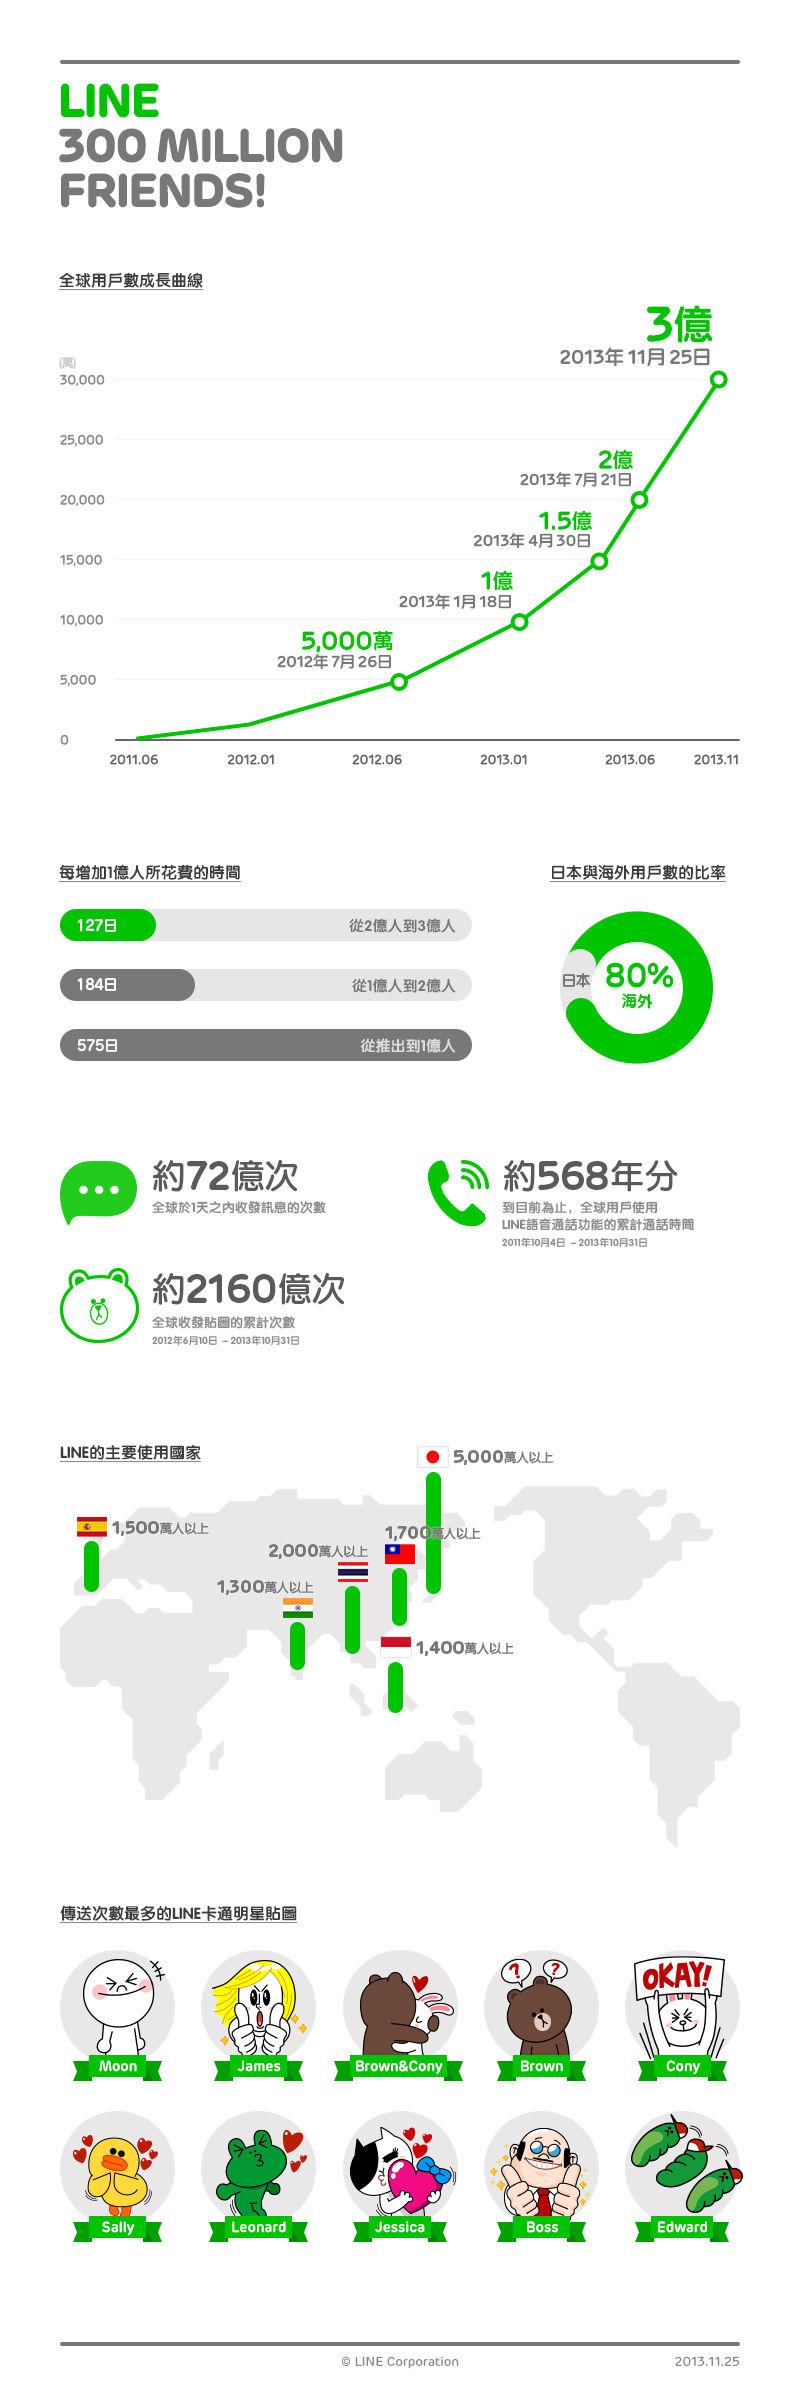 300million Infographic_cn Taiwan